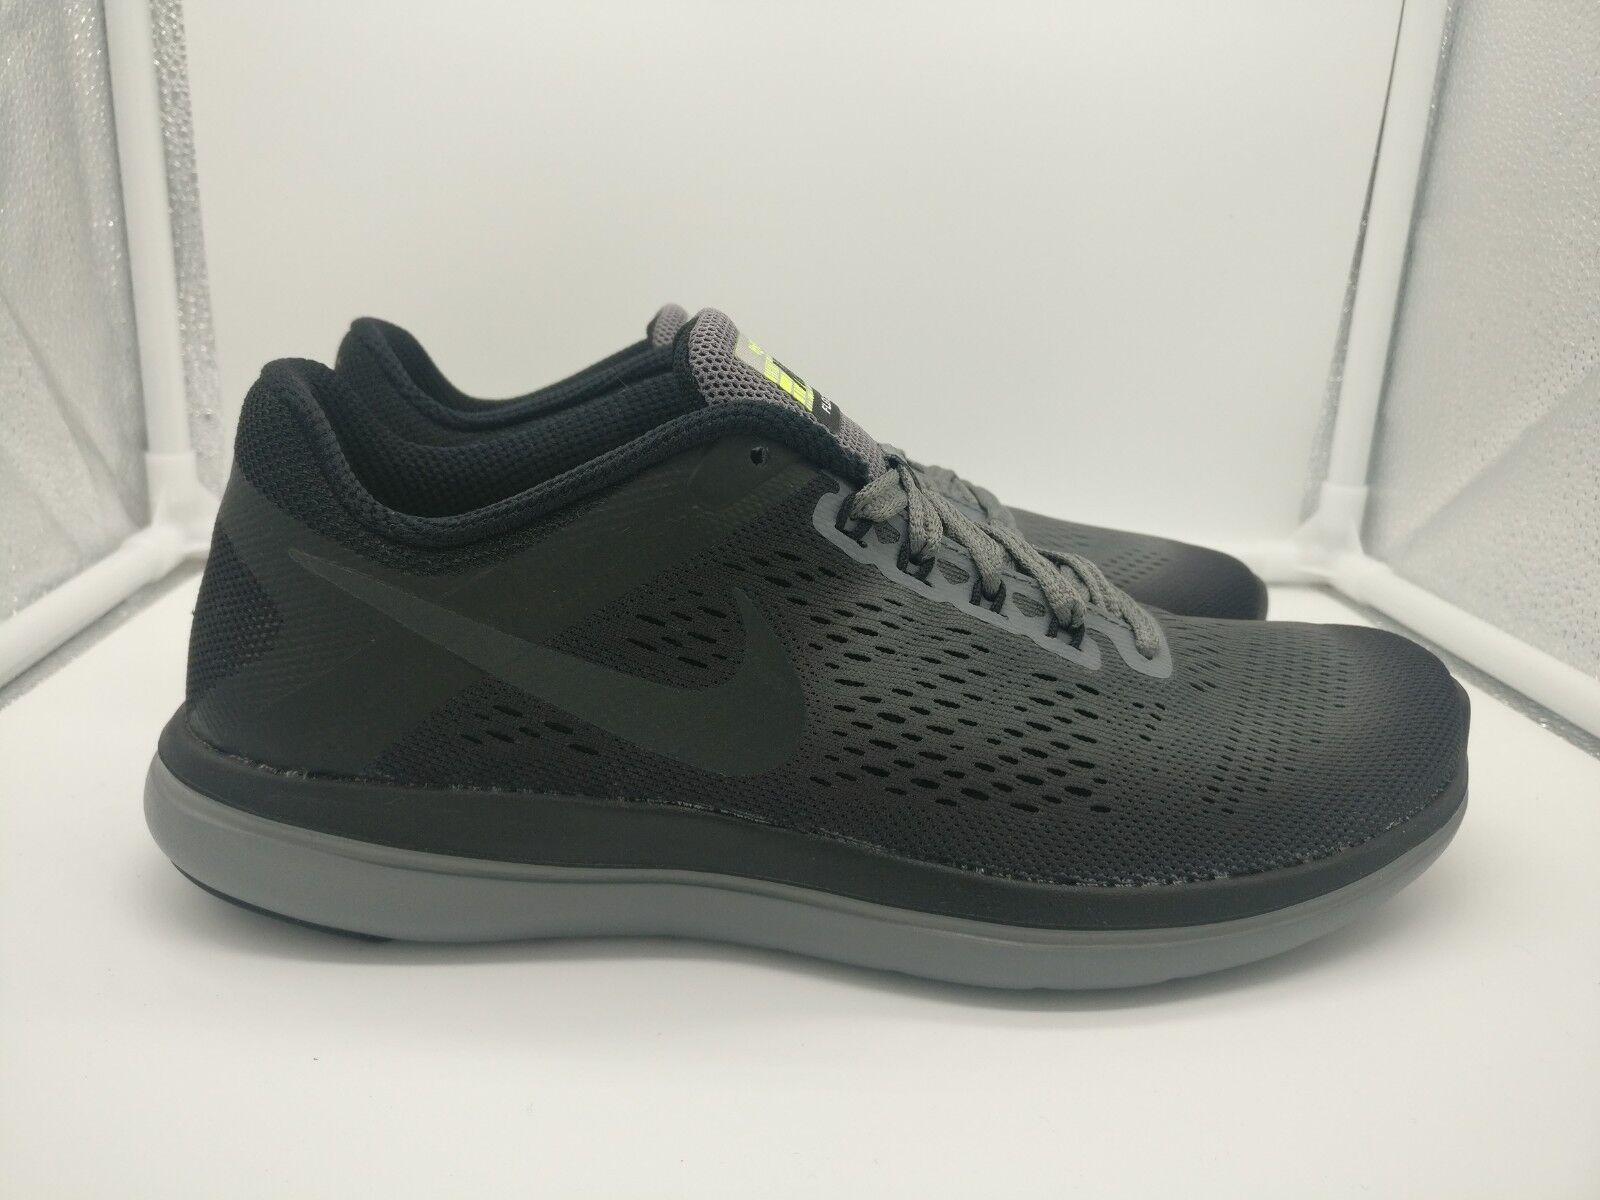 Nike femmes Flex 2018 RN Shield4 Cool Gris Hematite Noir 852447-001